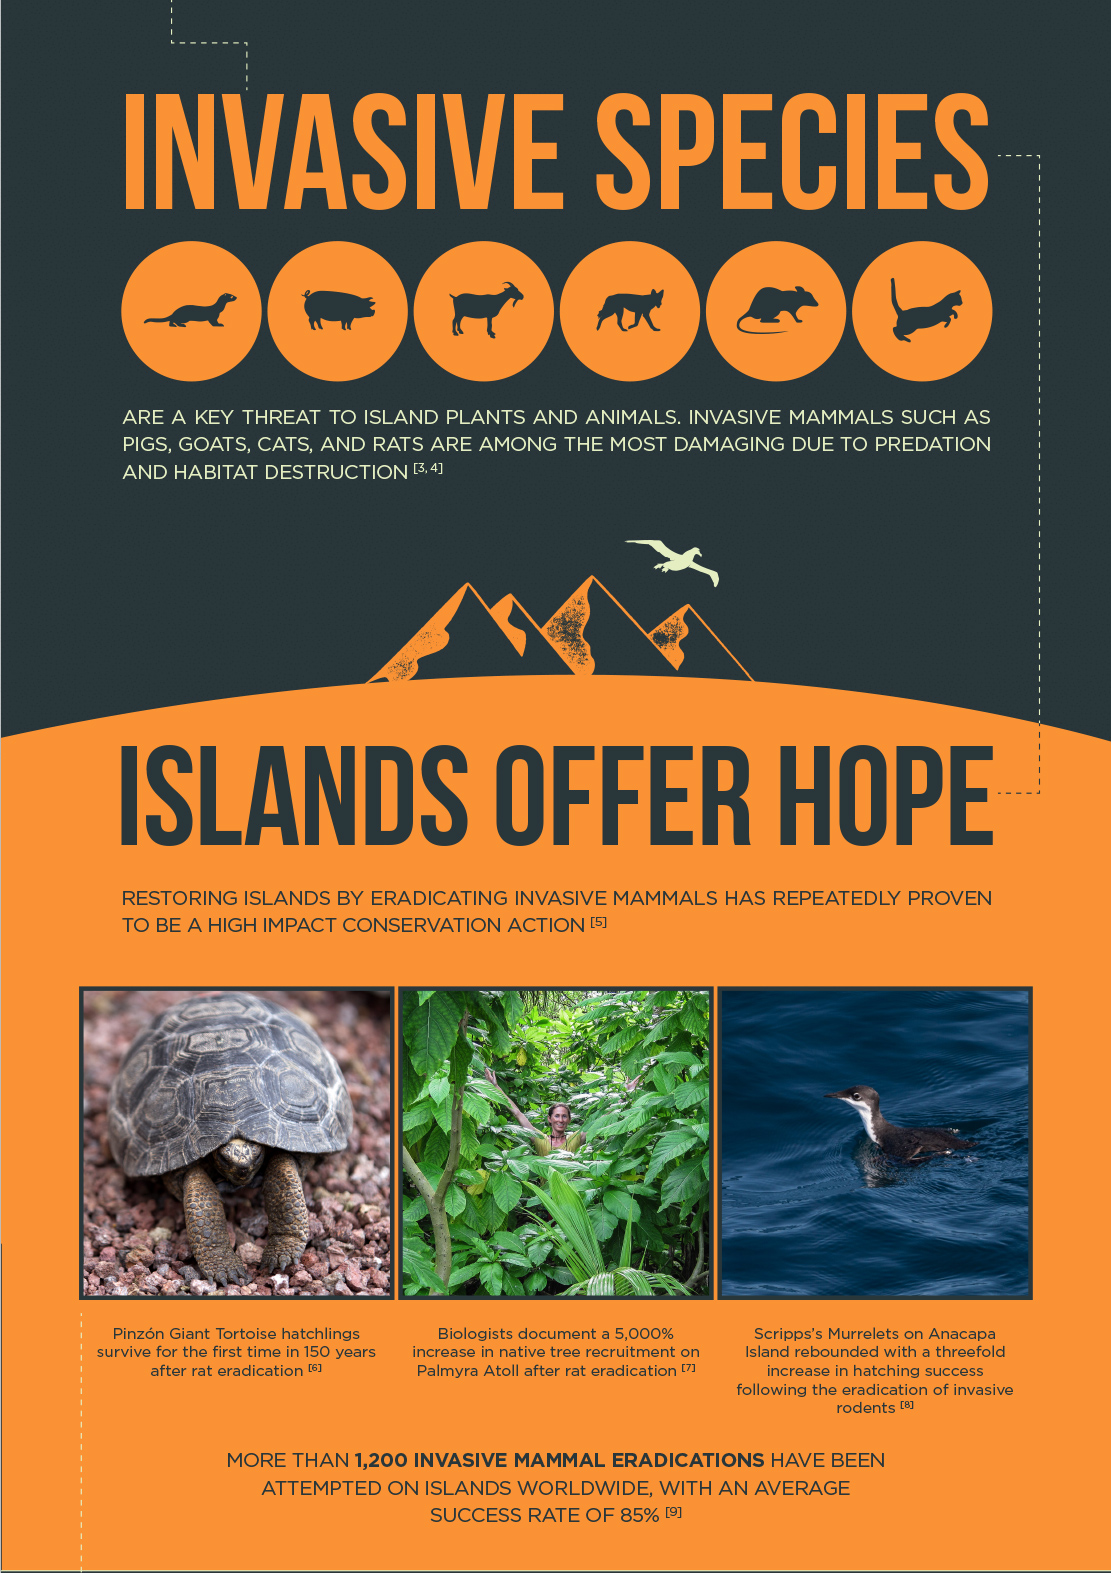 island-conservation-invasive-species-removal-hope-preventing-extinction-biodiversity-extinction-crisis